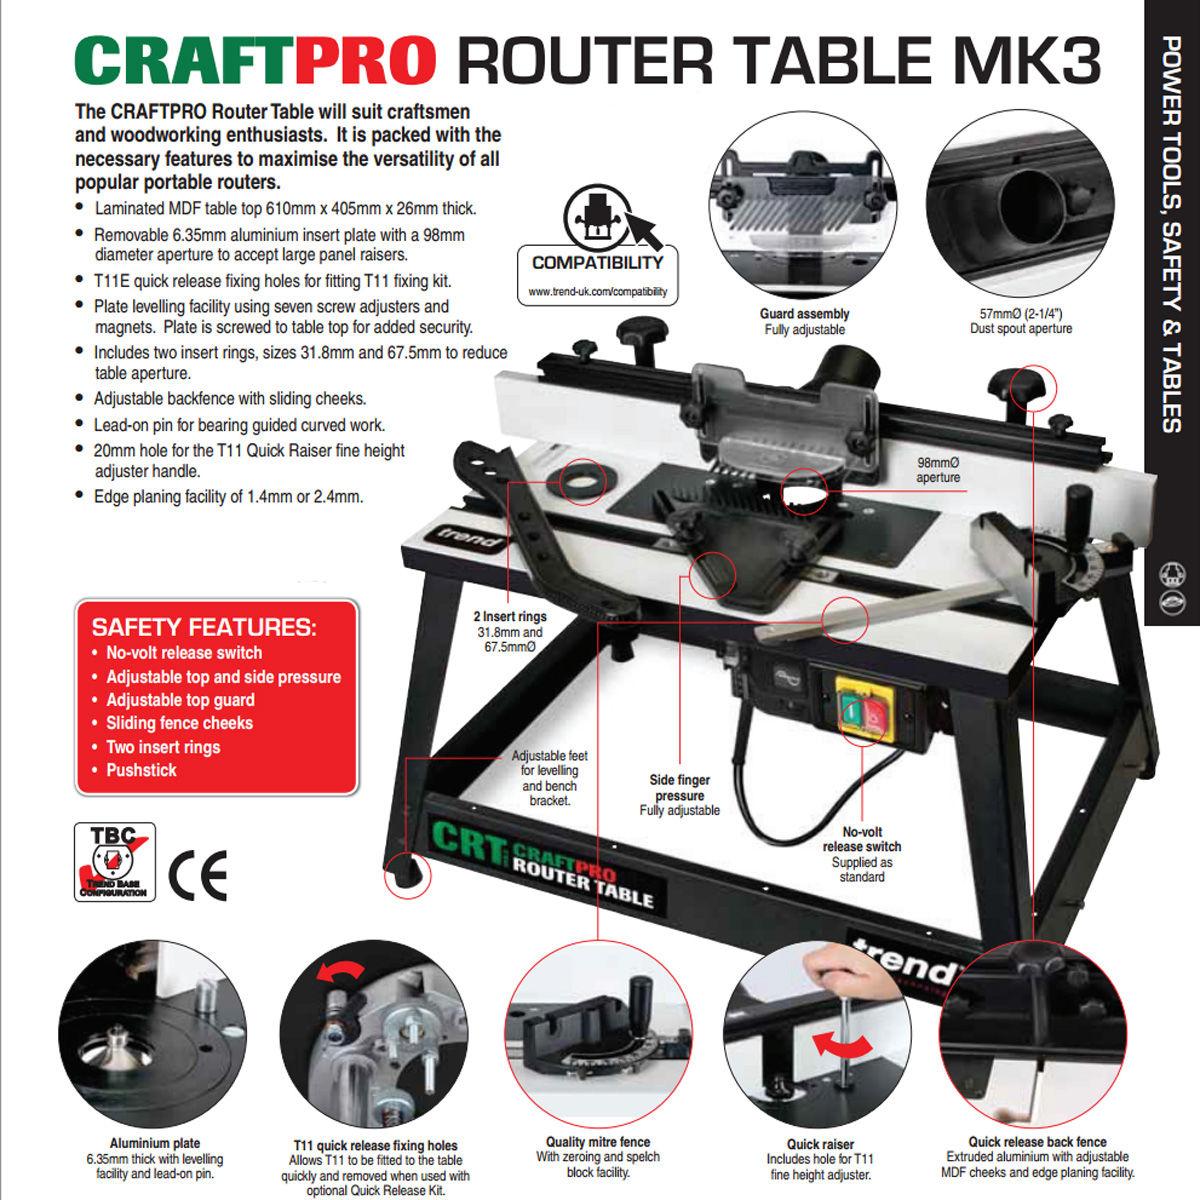 Toolstop trend crtmk3 craftpro router table mk3 240v trend crtmk3 craftpro router table mk3 240v keyboard keysfo Choice Image